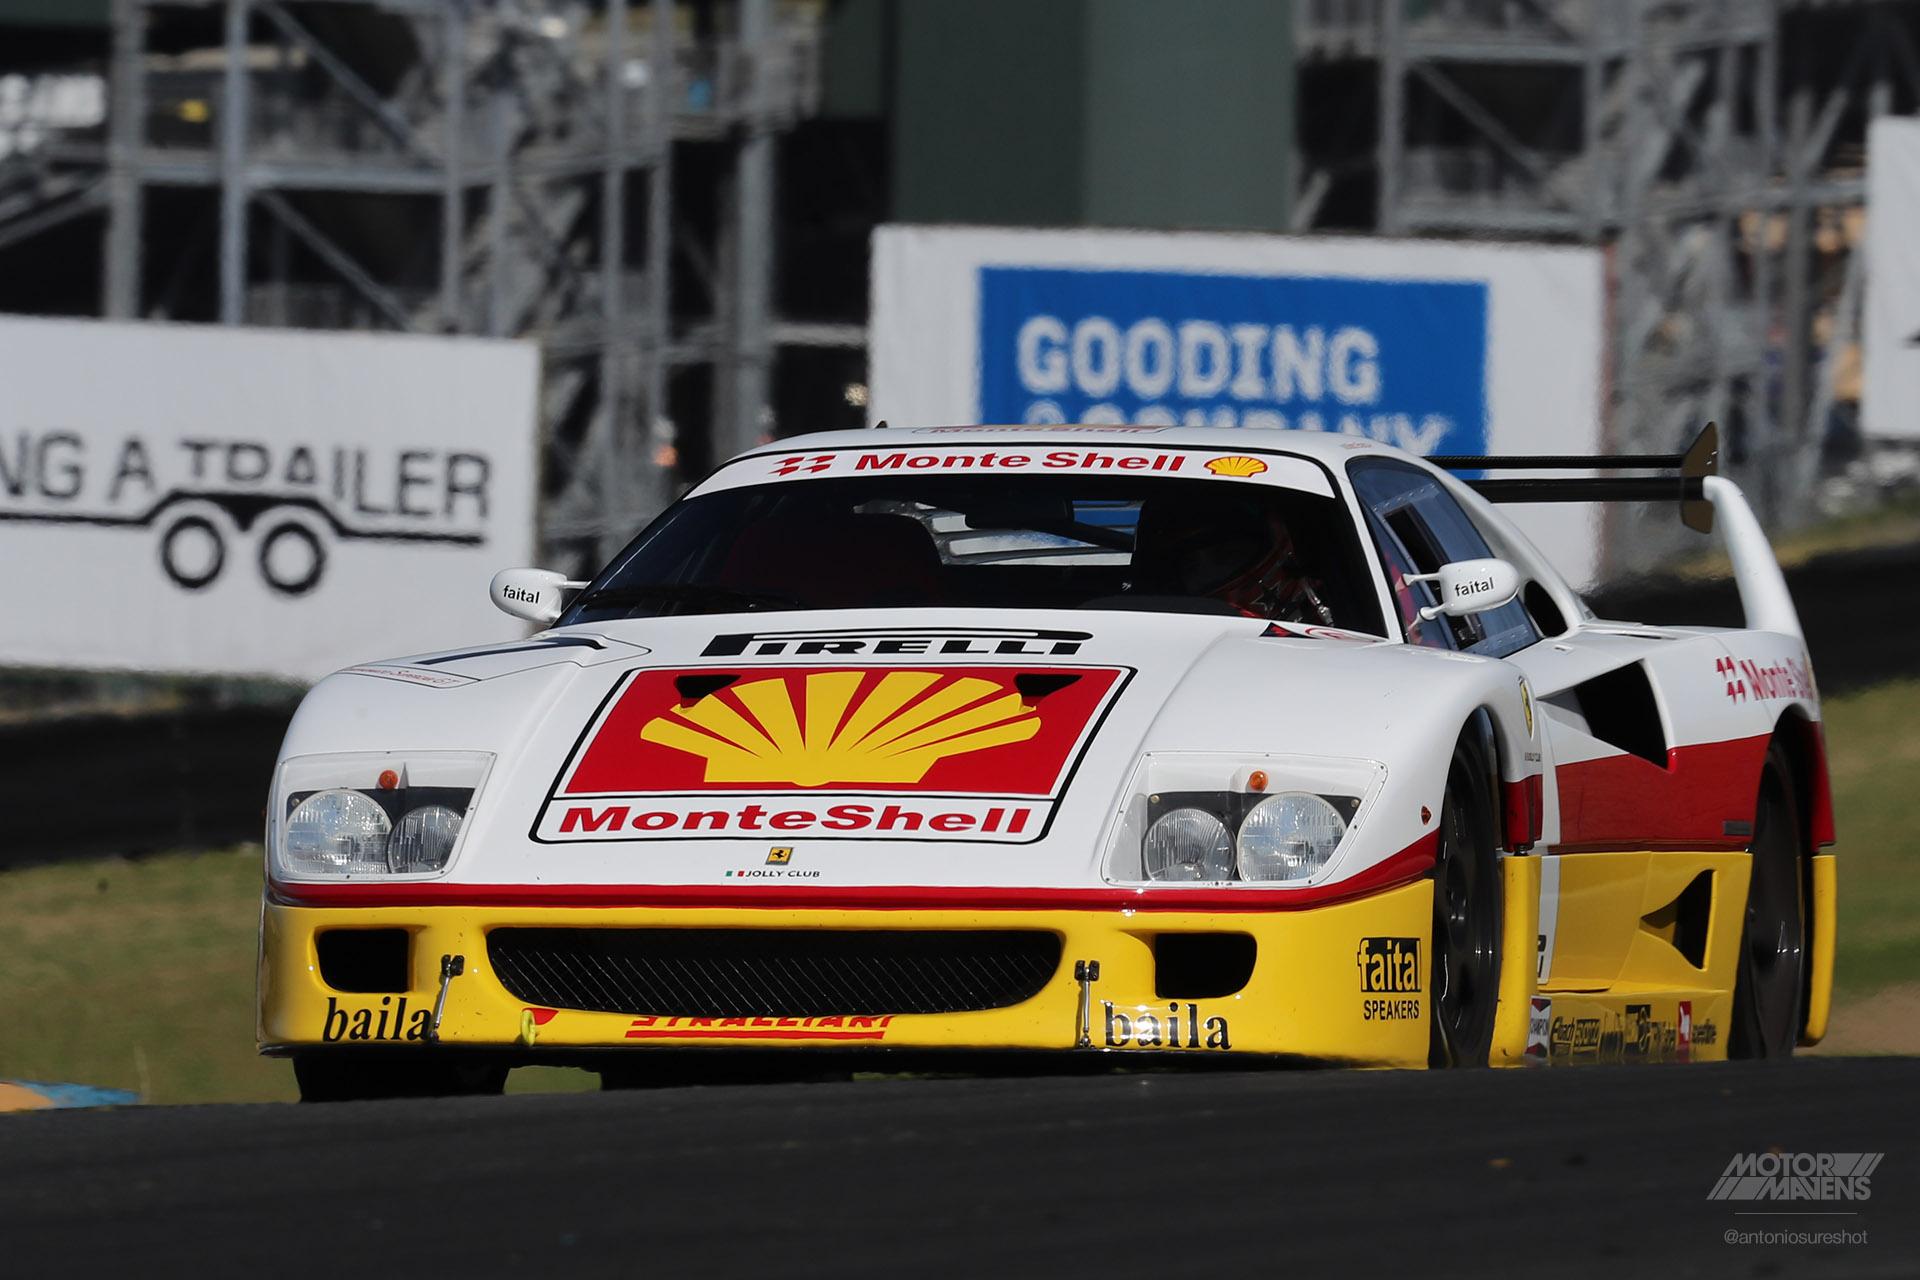 Ferrari F40 LM, F40, Ferrari, Sonoma Speed Festival